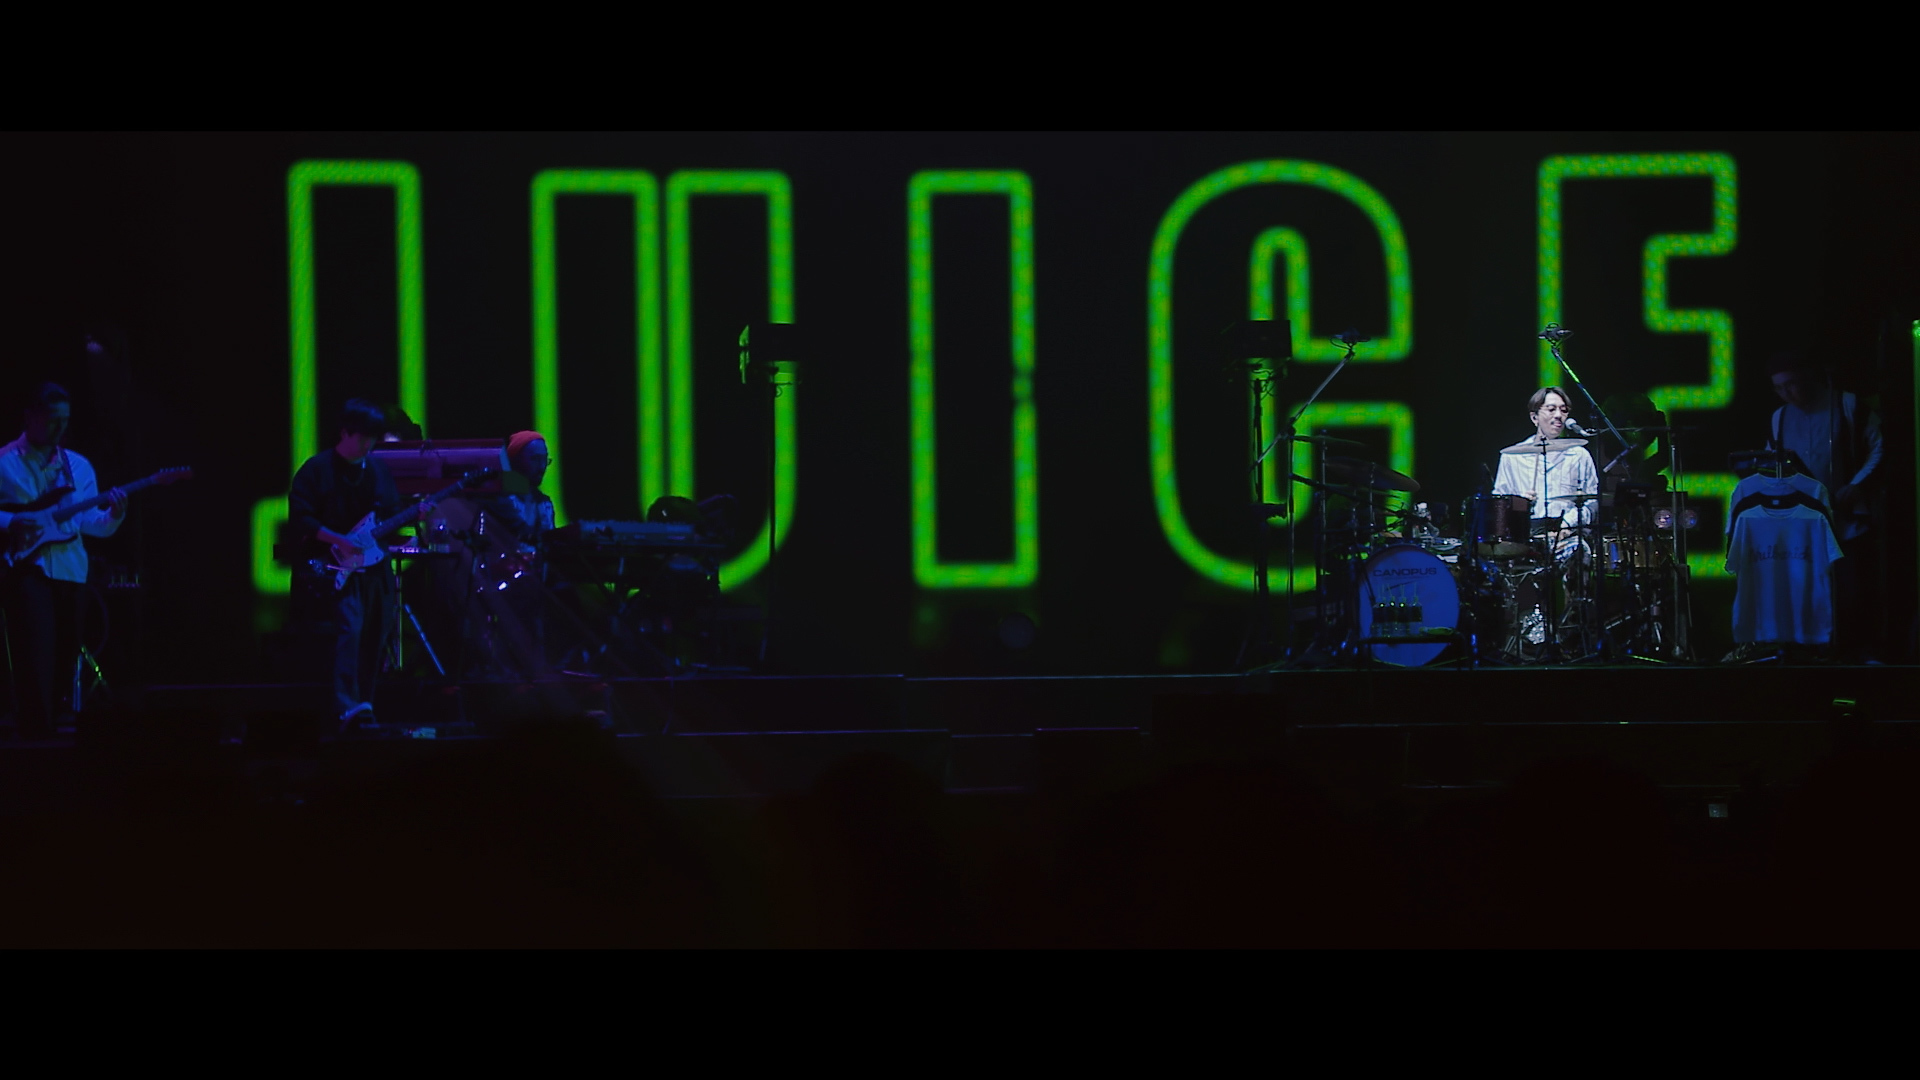 Nulbarich - JUICE Live ver. @2018.11.02 NIPPON BUDOKAN/2月8日正午12:00  YouTubeにてプレミア公開